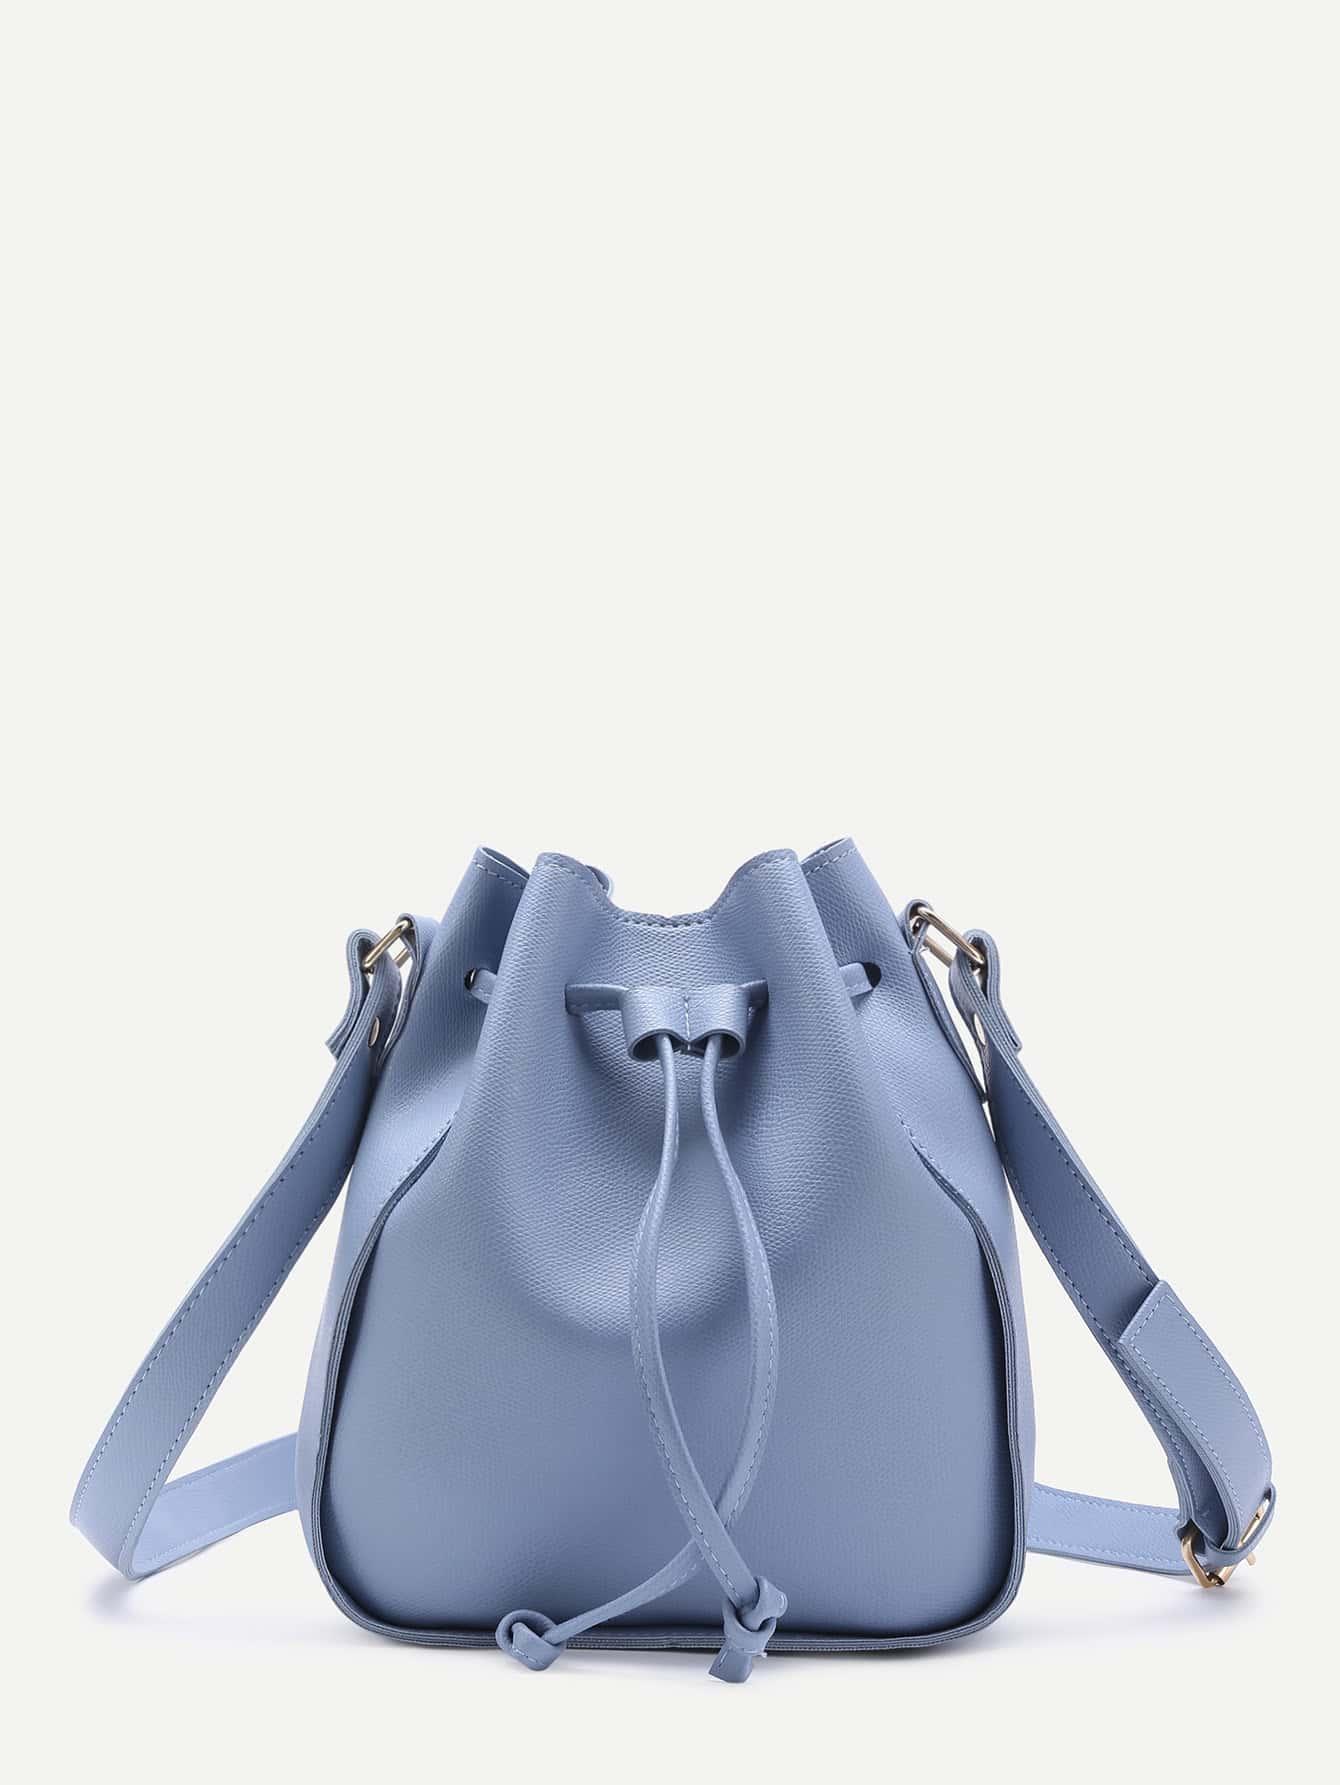 bag170504905_1